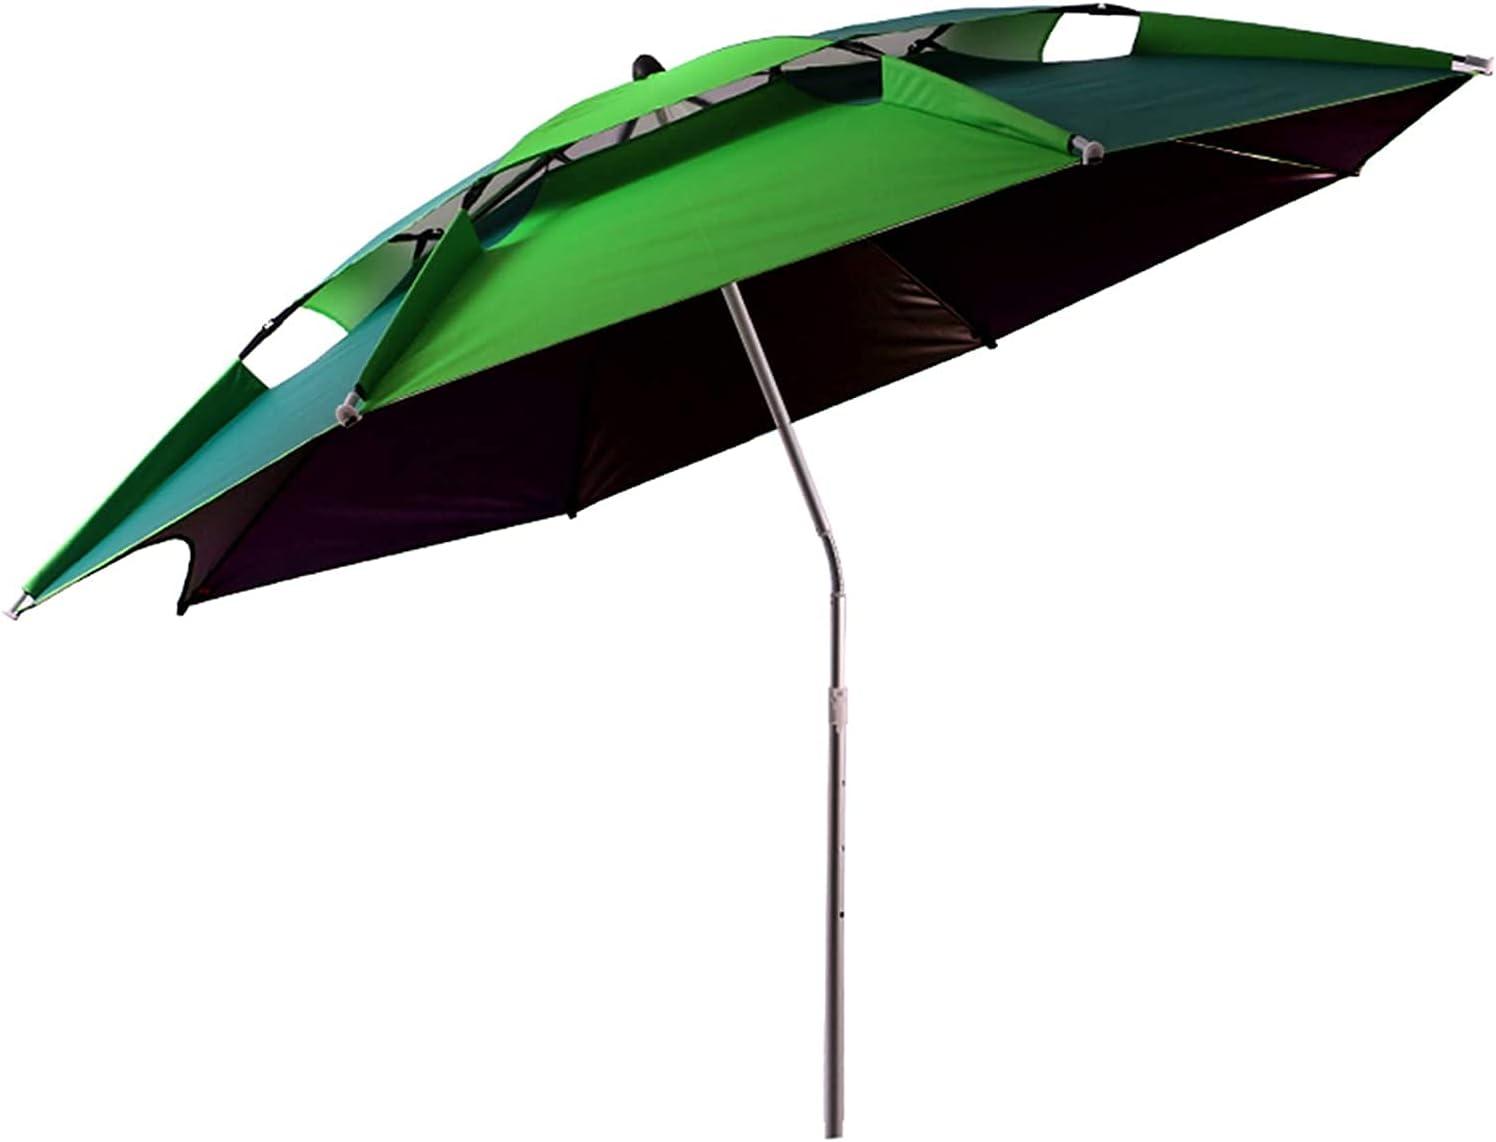 Parasols Garden Dallas Mall UV50 + New product type Protective Umbrel Fishing Beach